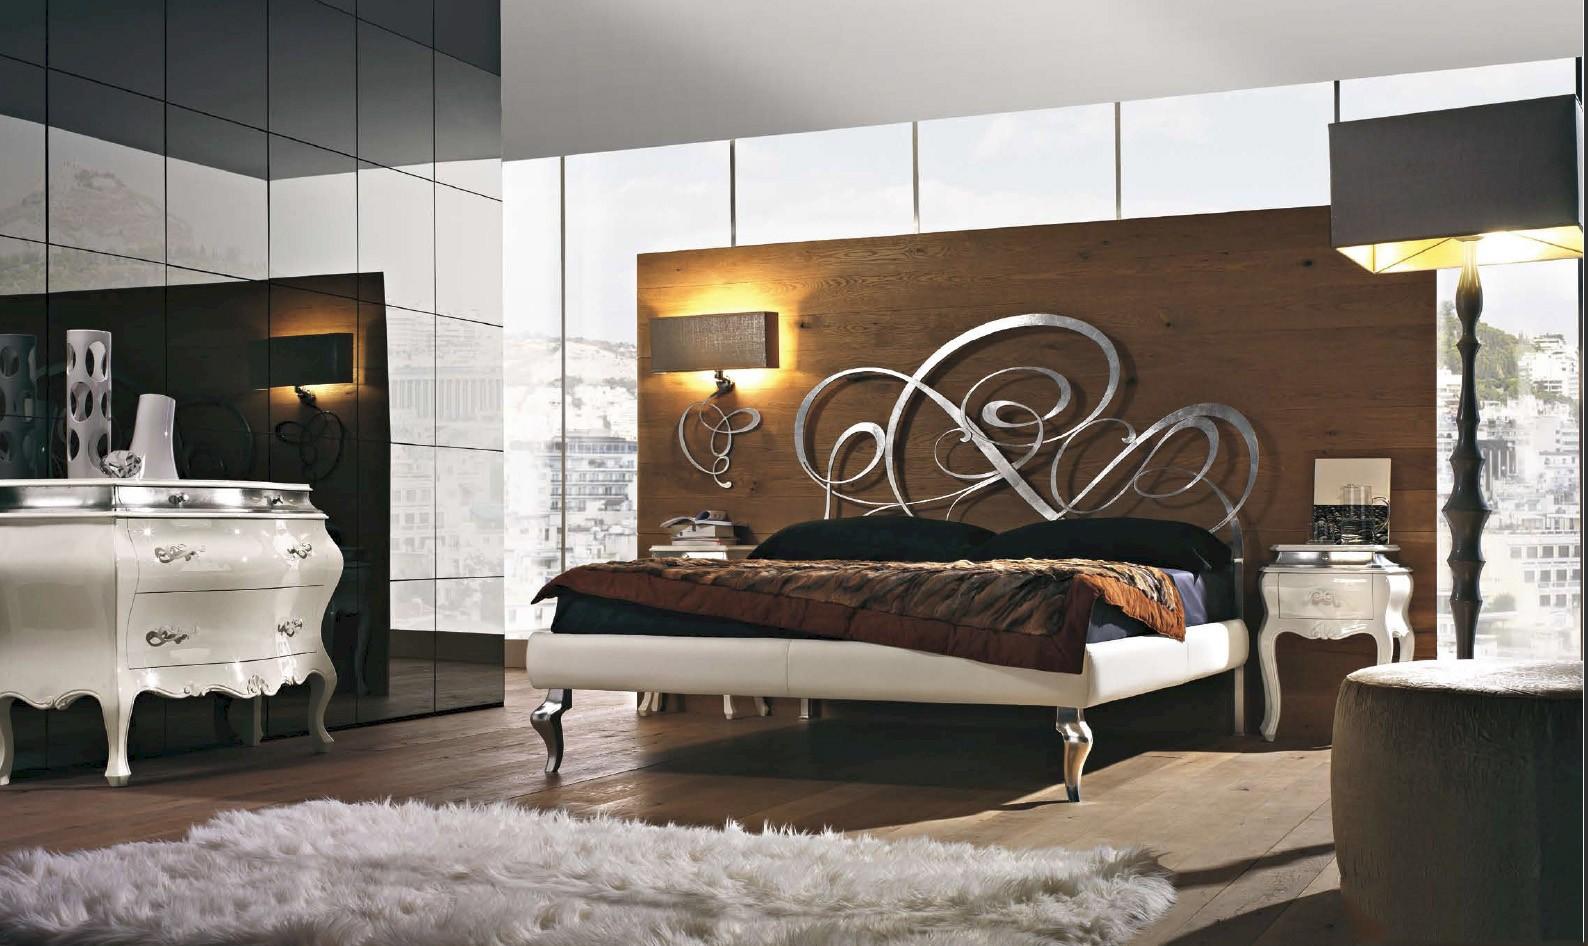 спальня в стиле модерн идеи декора